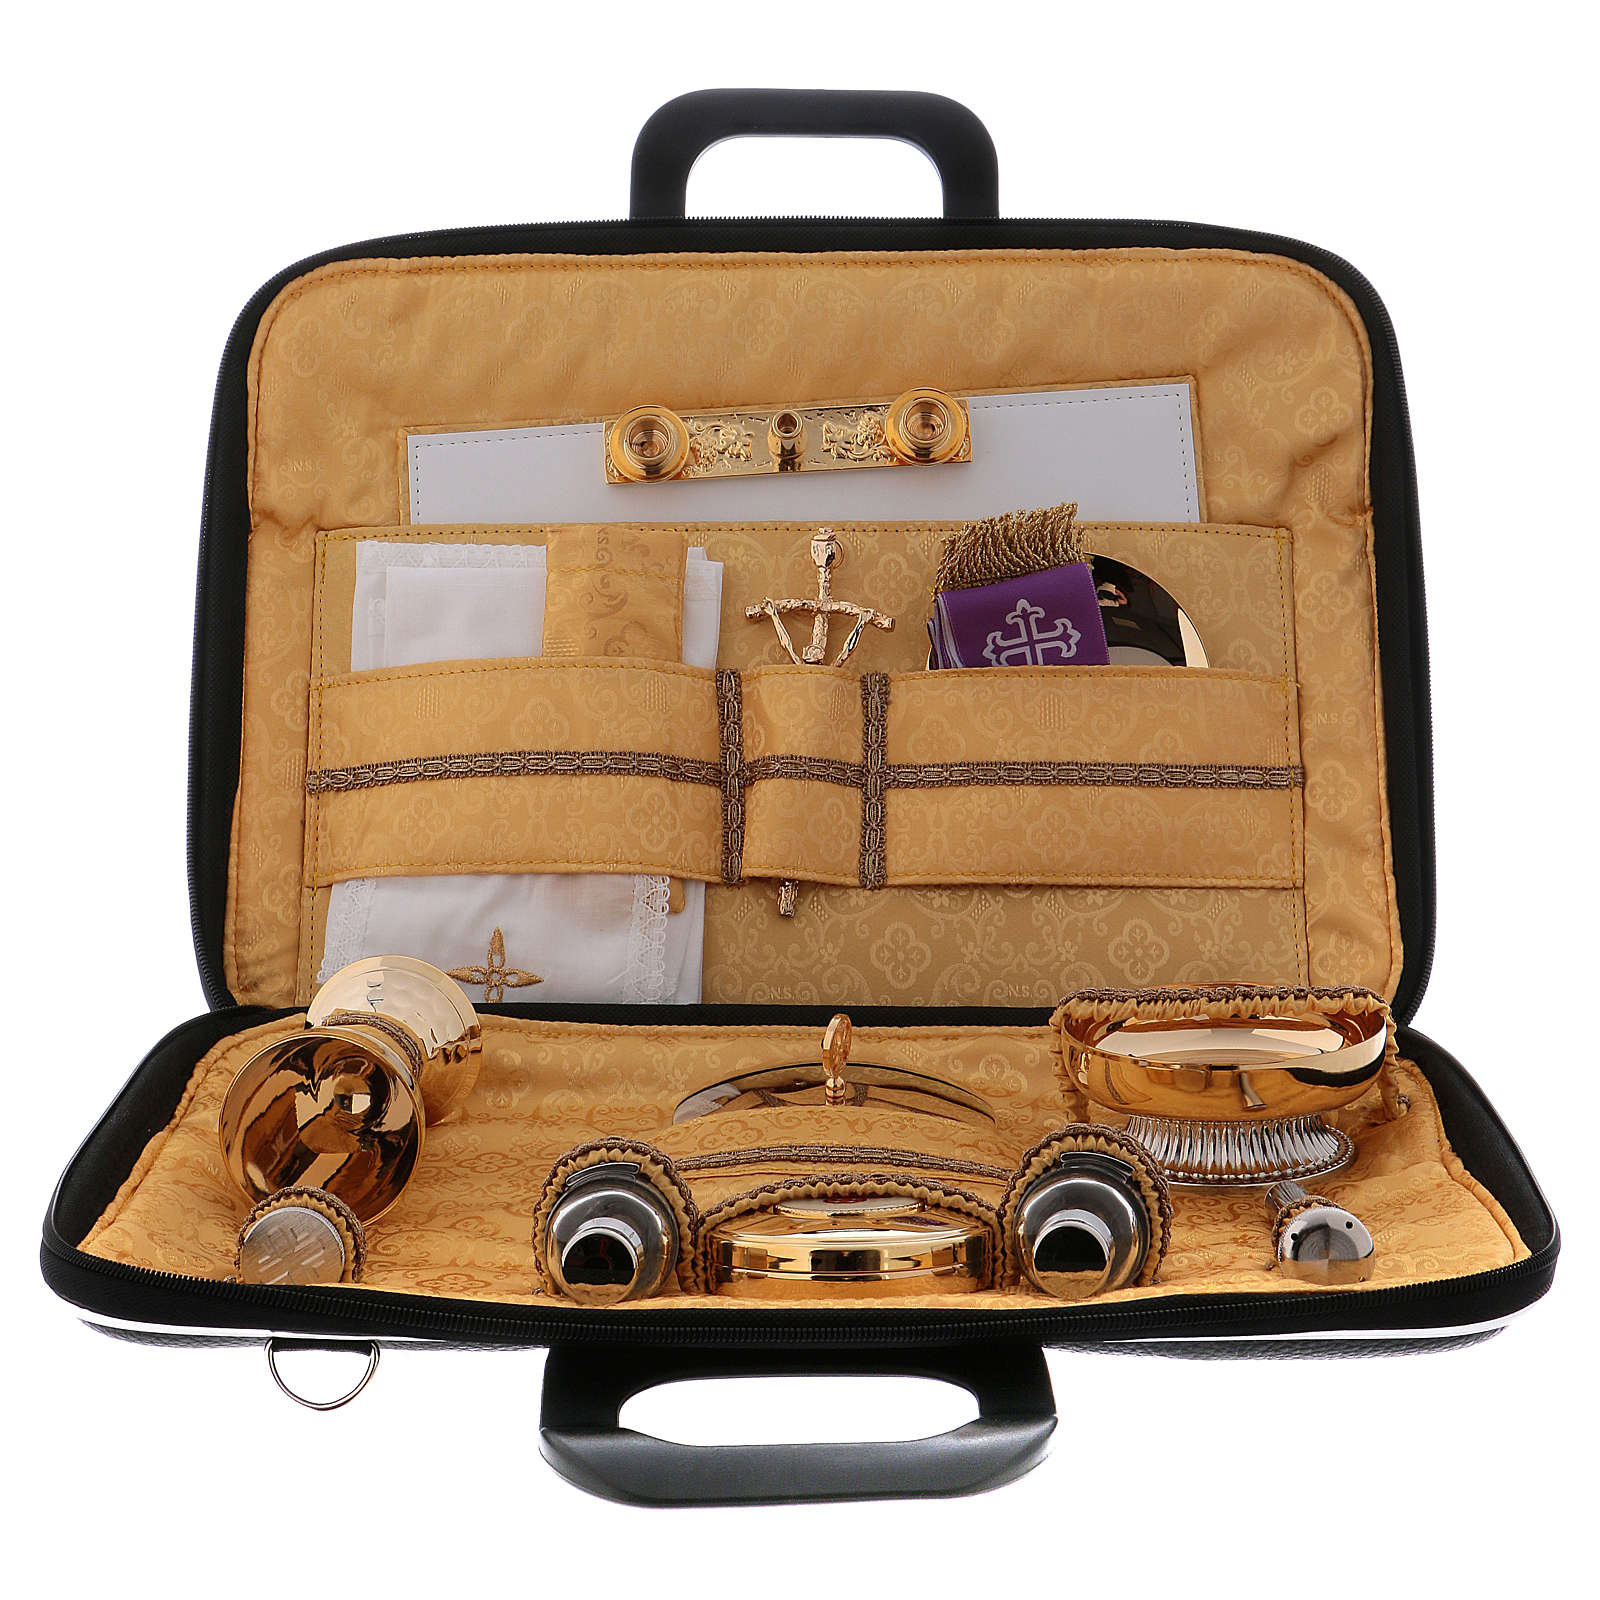 Cartella kit messa in ecopelle e raso giallo modello portapc 3